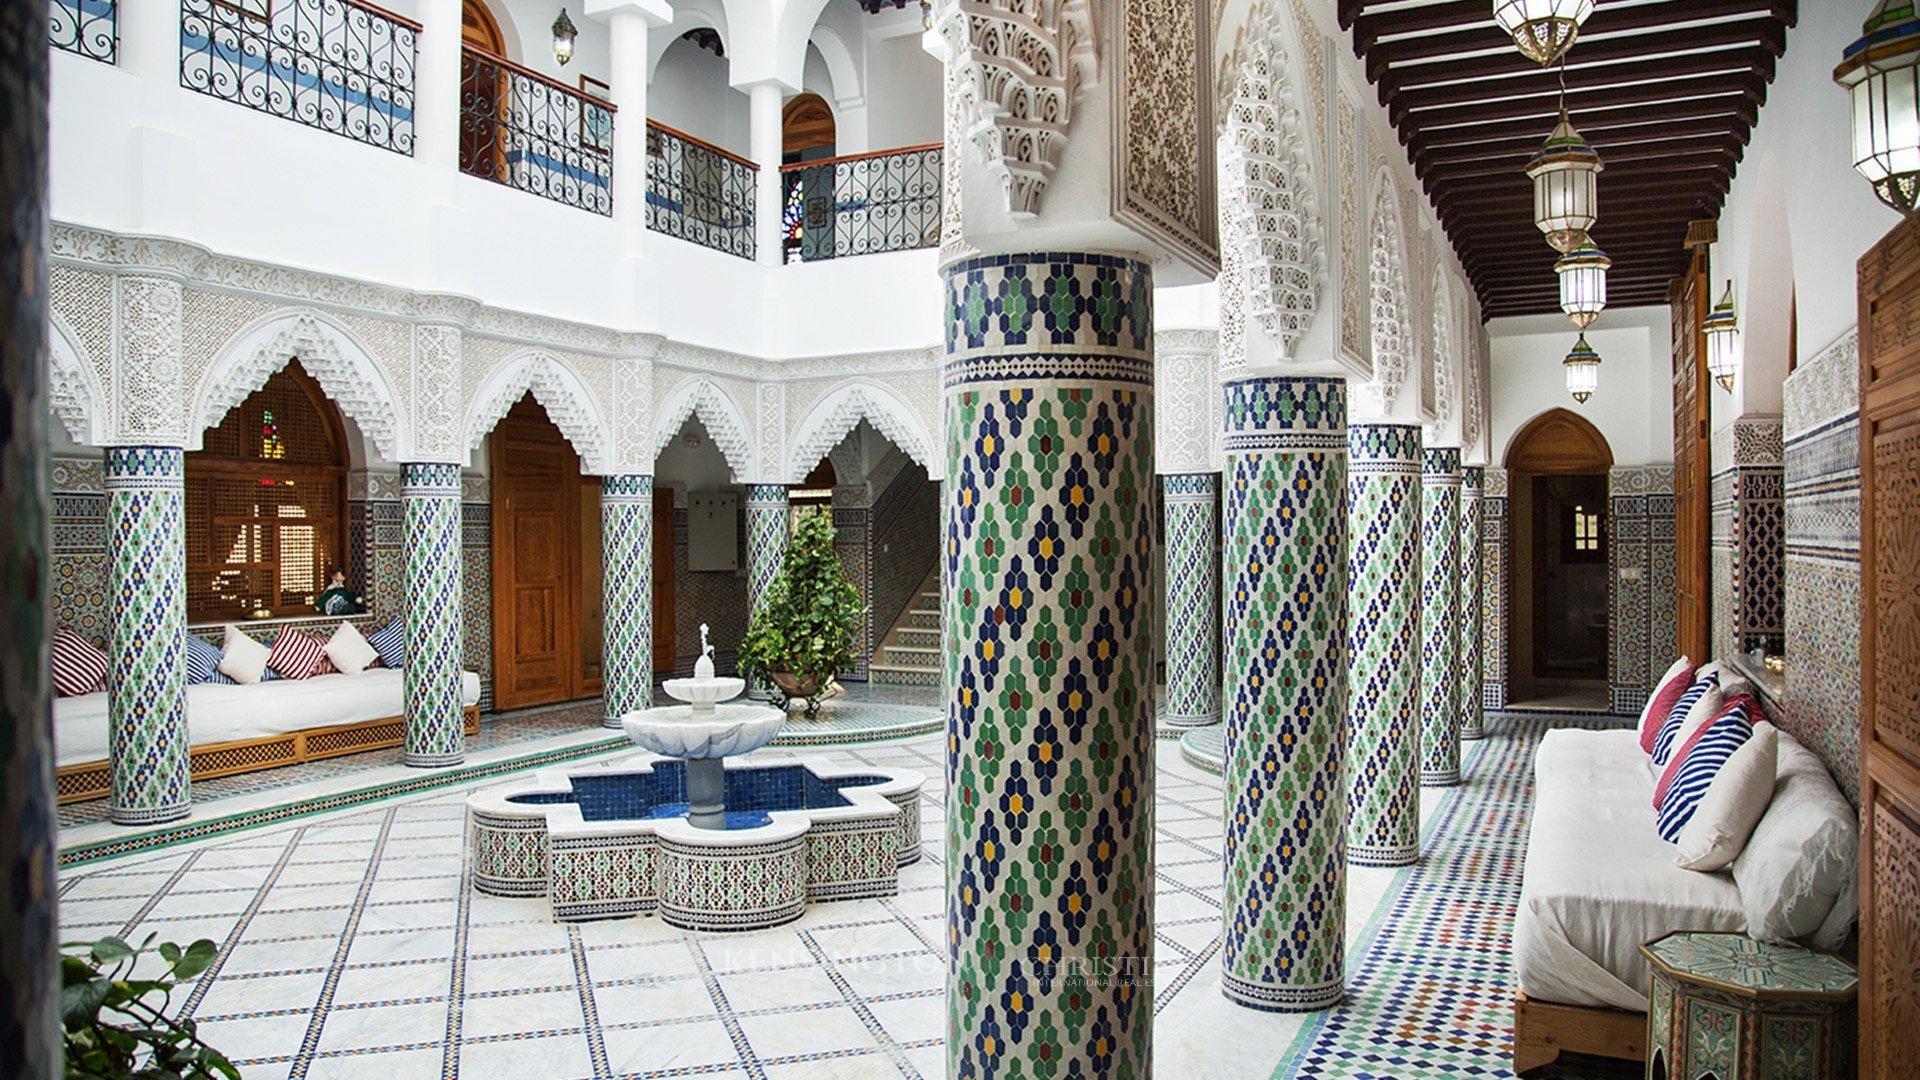 KPPM00745: Villa Liza Luxury Villa Tanger Morocco